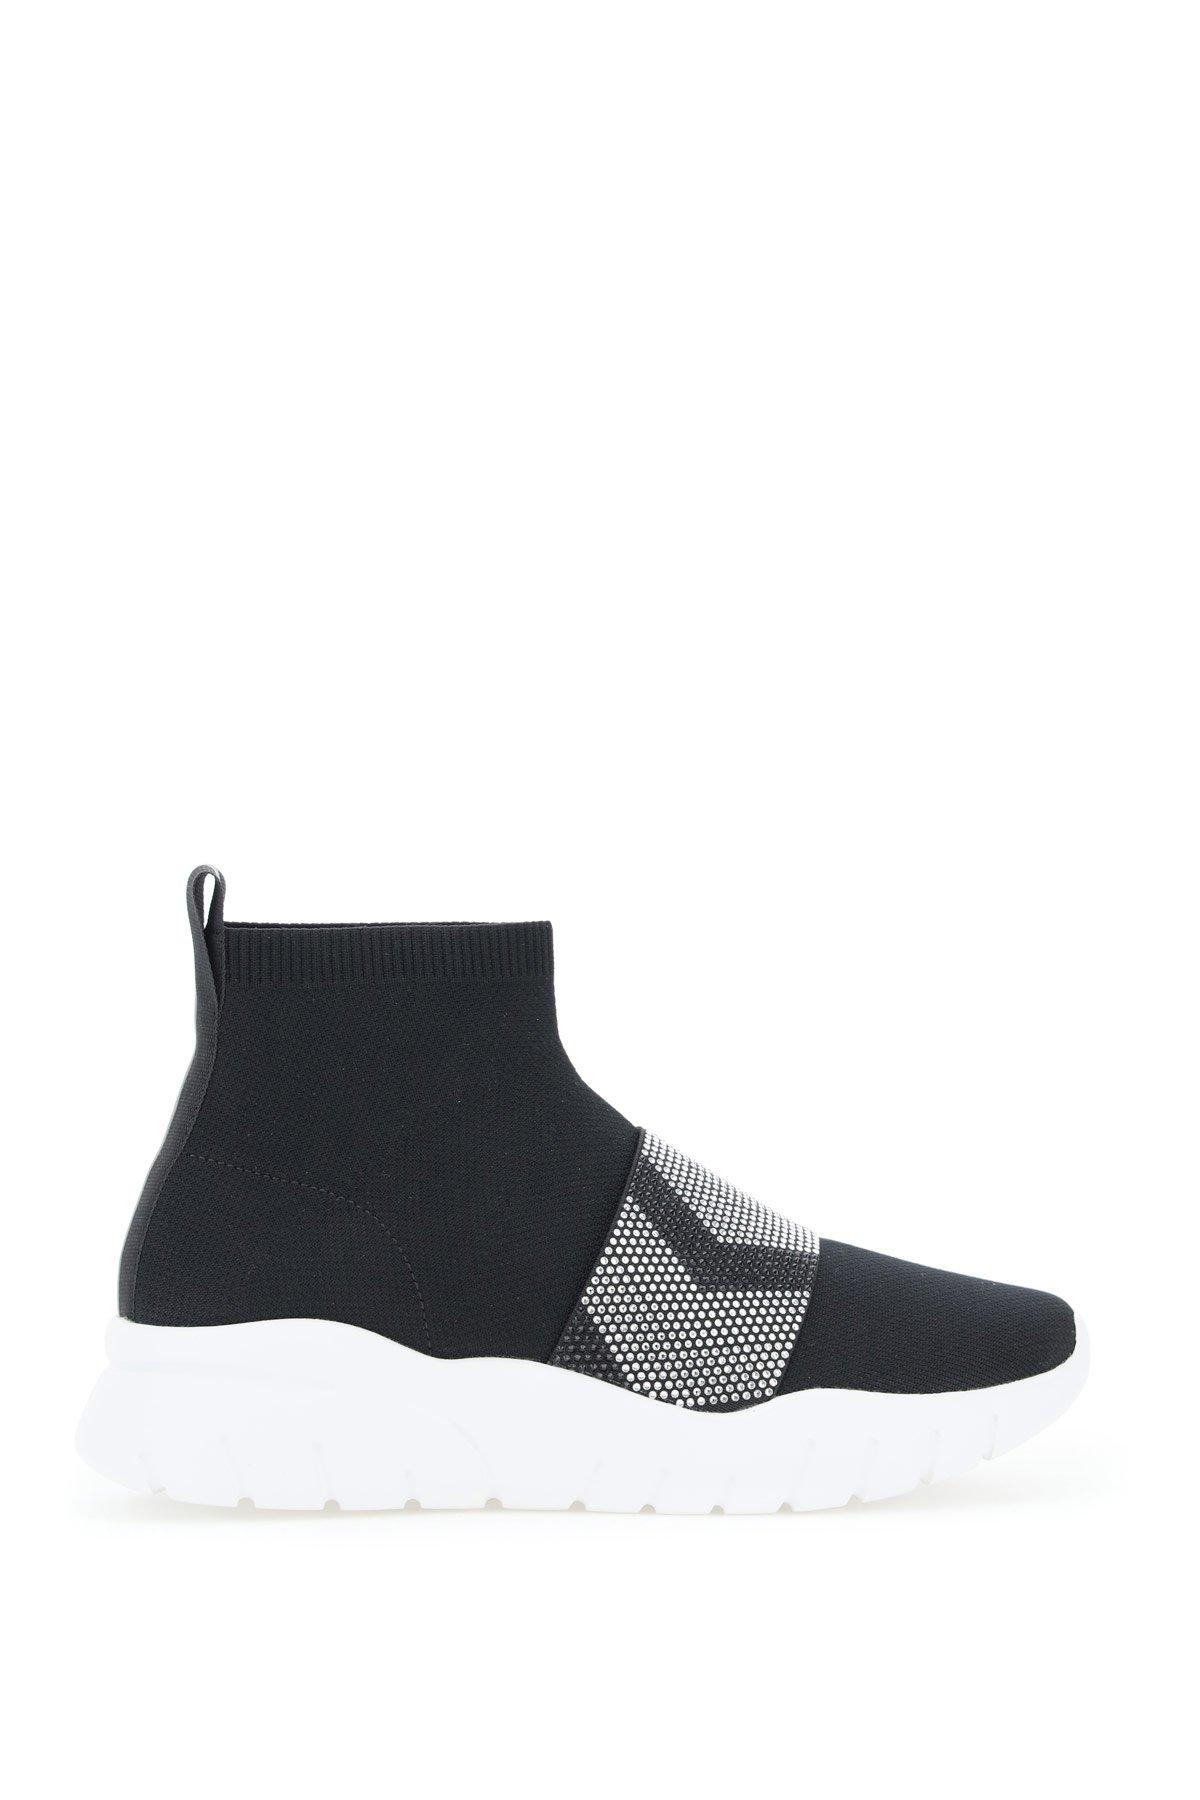 Bally sneakers socks crystal brixie